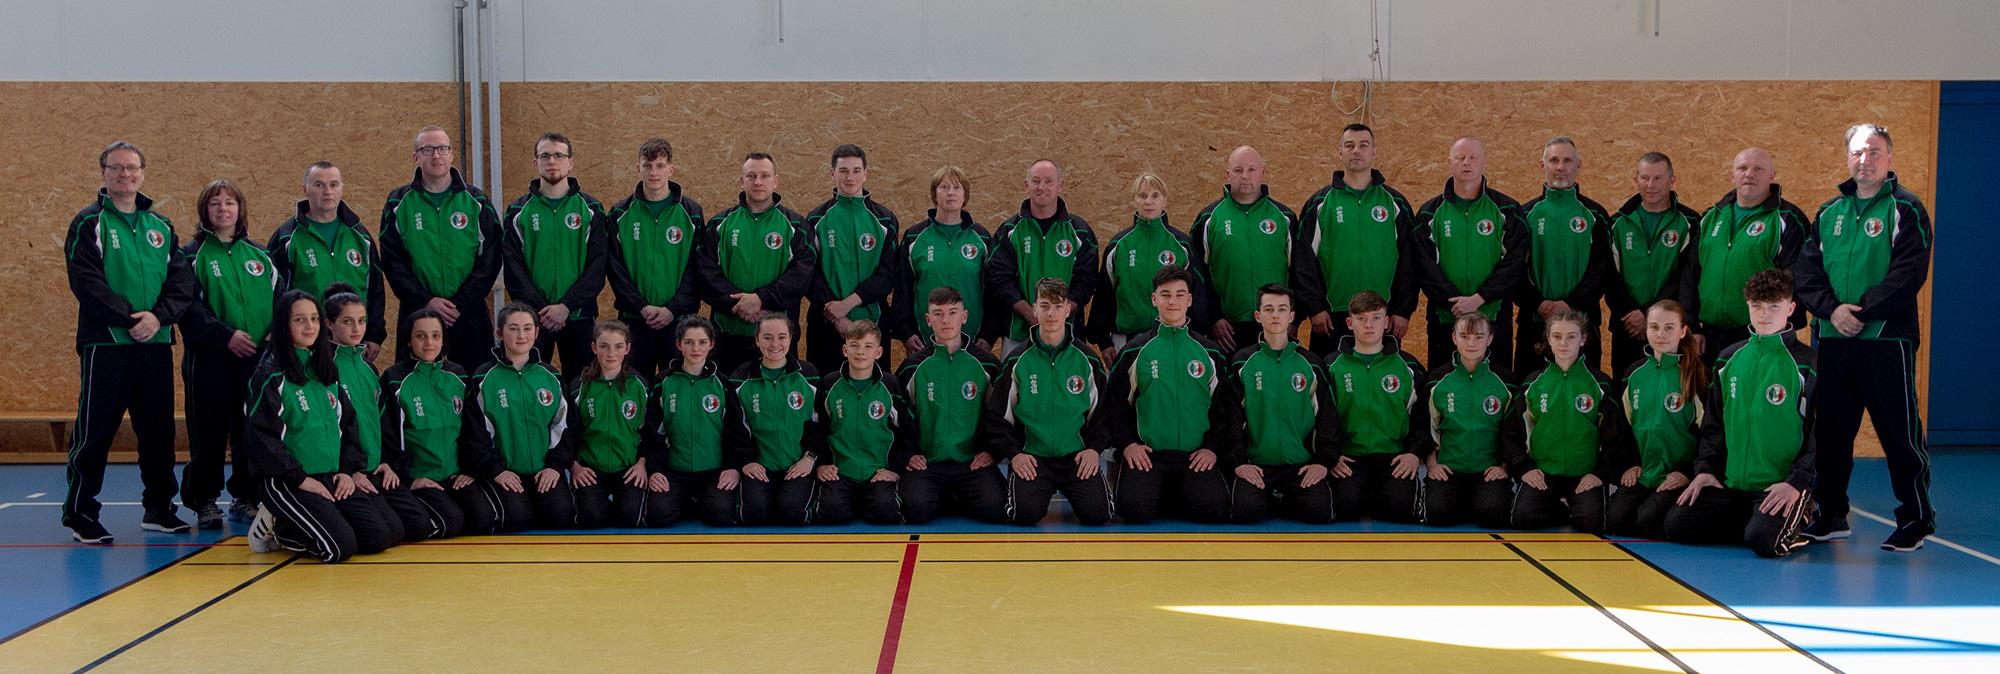 SKIF Ireland Hradec Kralove SKIF Grand Prix Squad